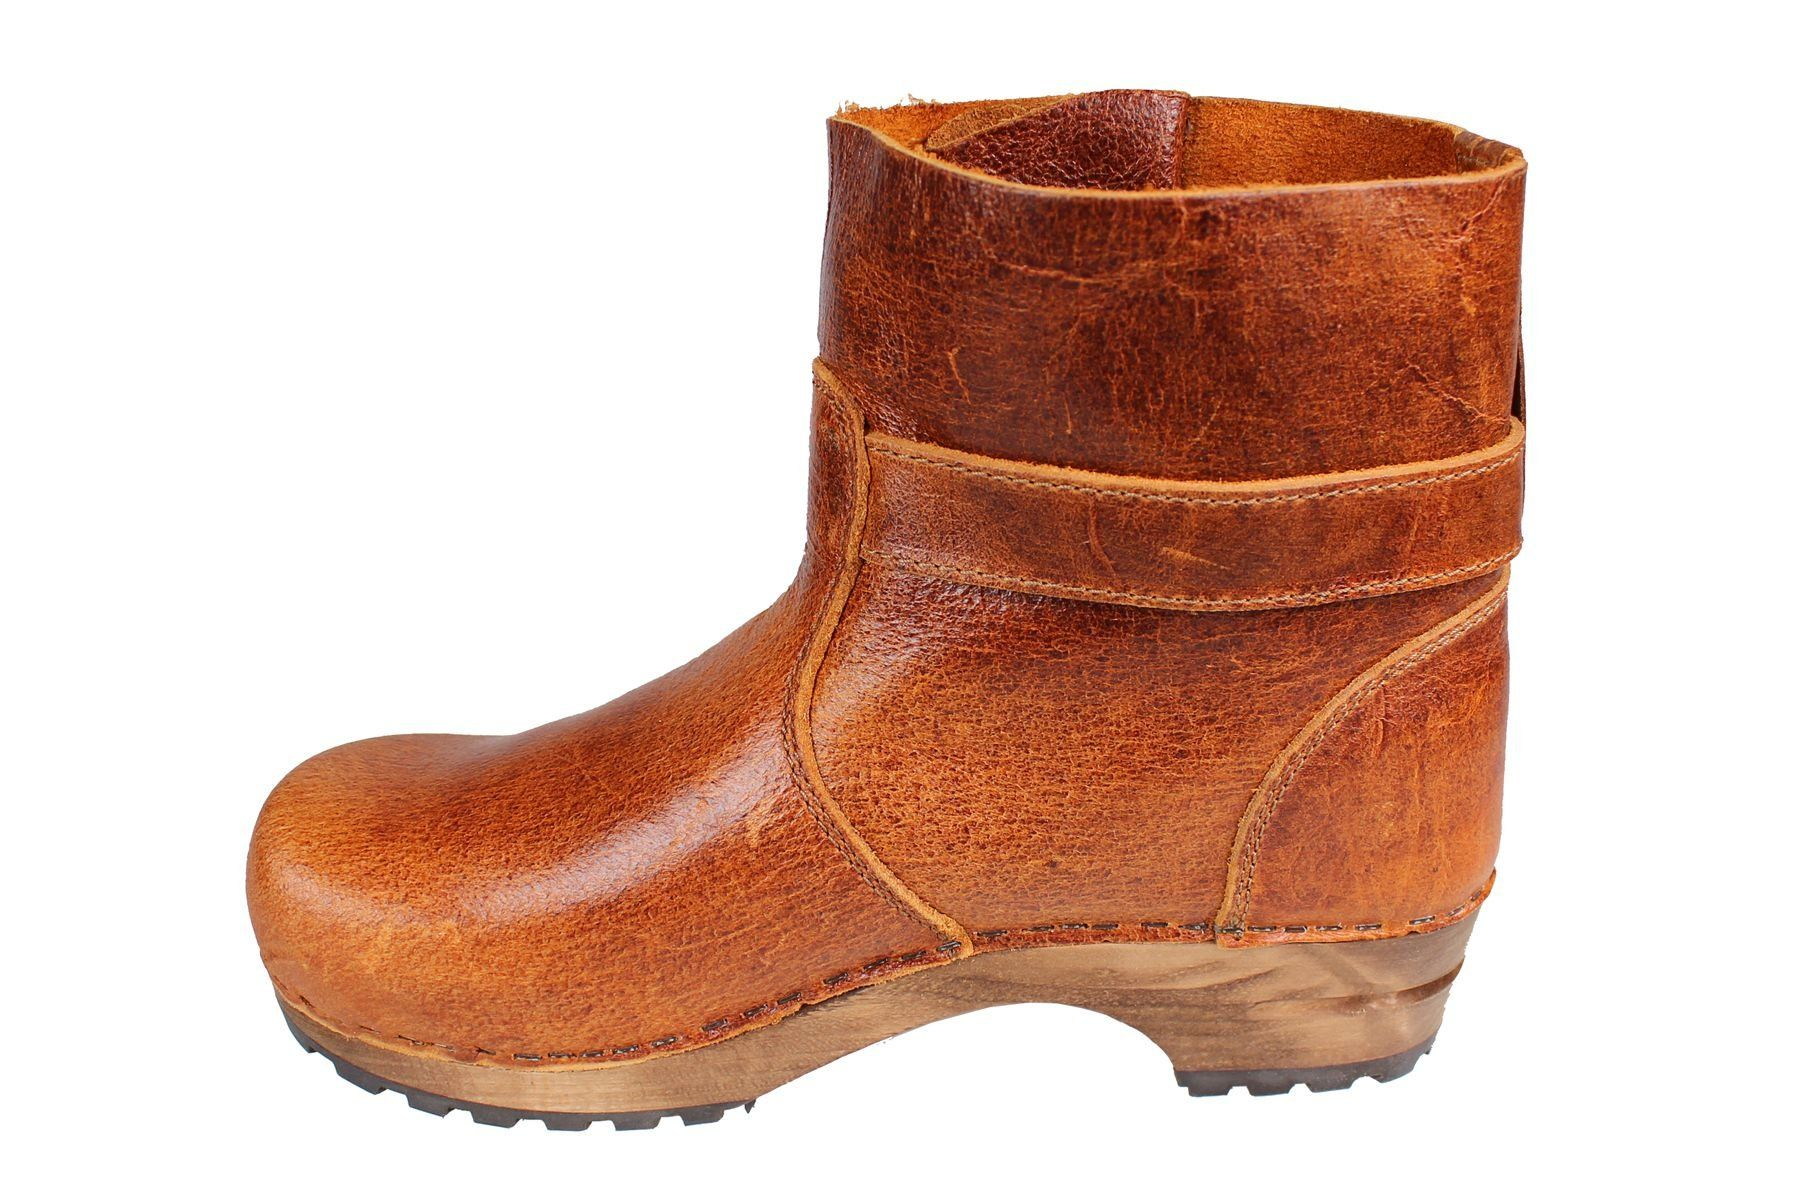 Lotta's Mina Clog Boot in Cognac